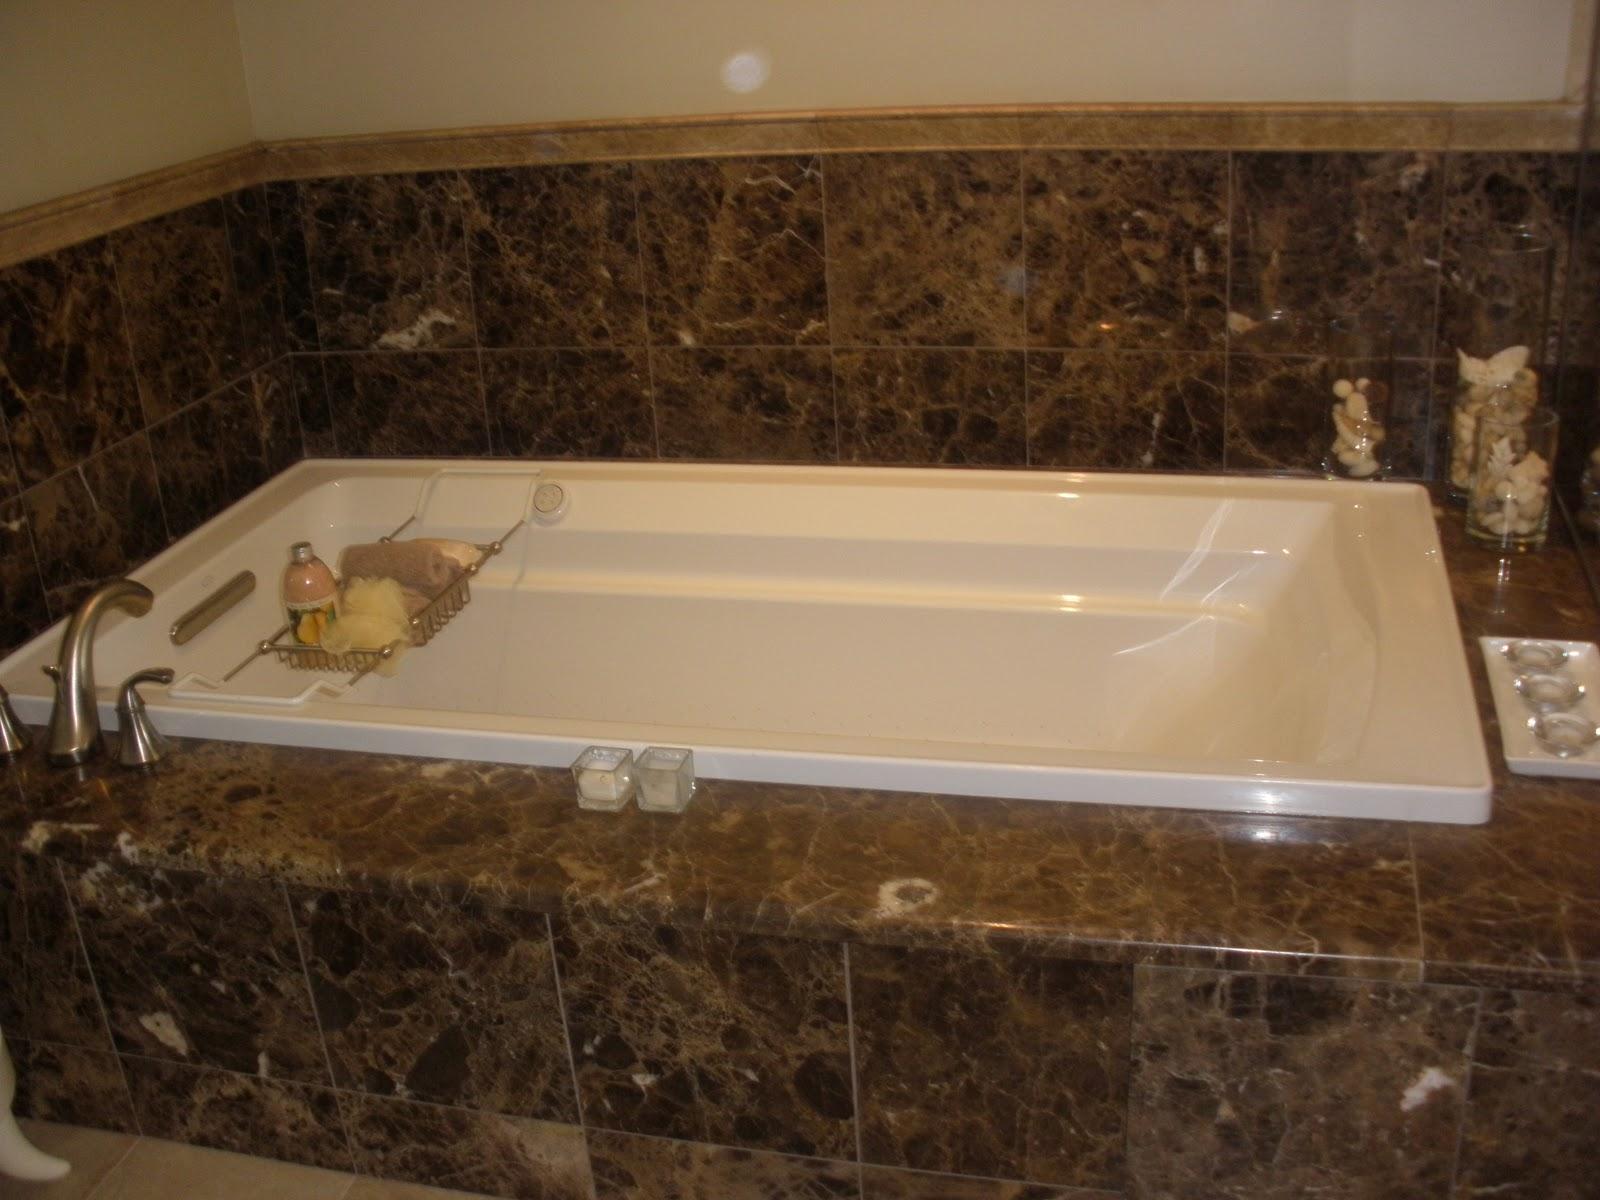 Custom Bathtub Surrounds 28 Images Custom Tub Surrounds Chion Floors Custom Tub Decks And